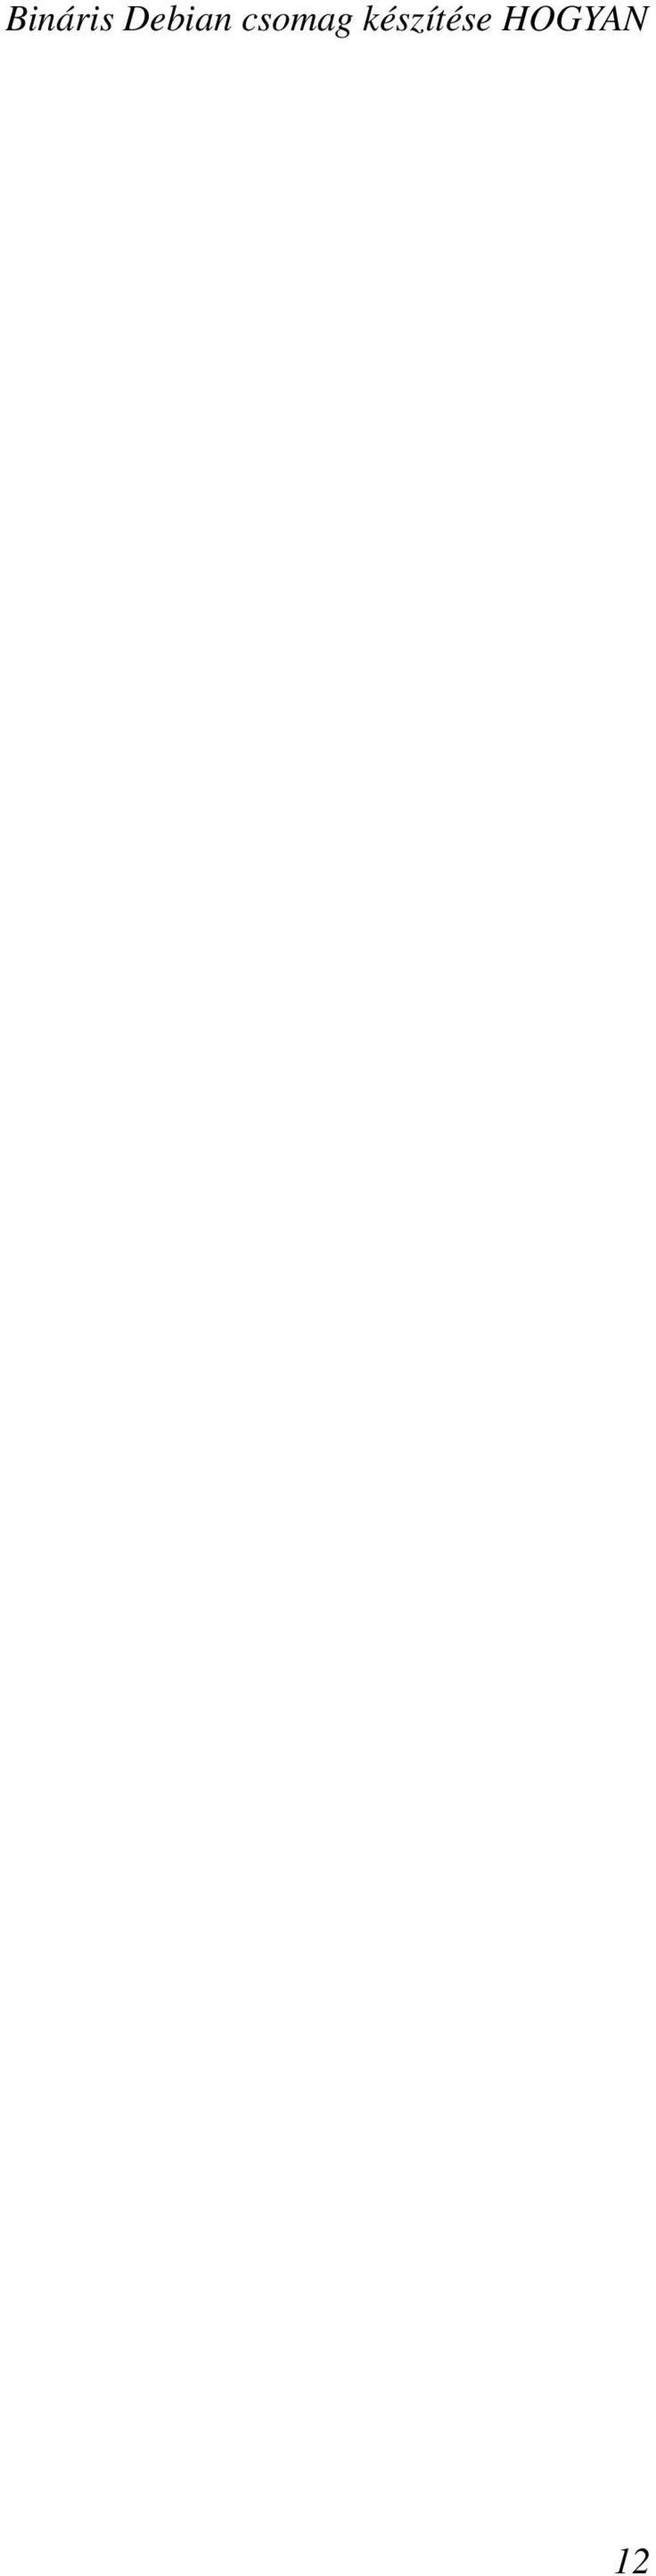 binárisok hivatalos oldala)